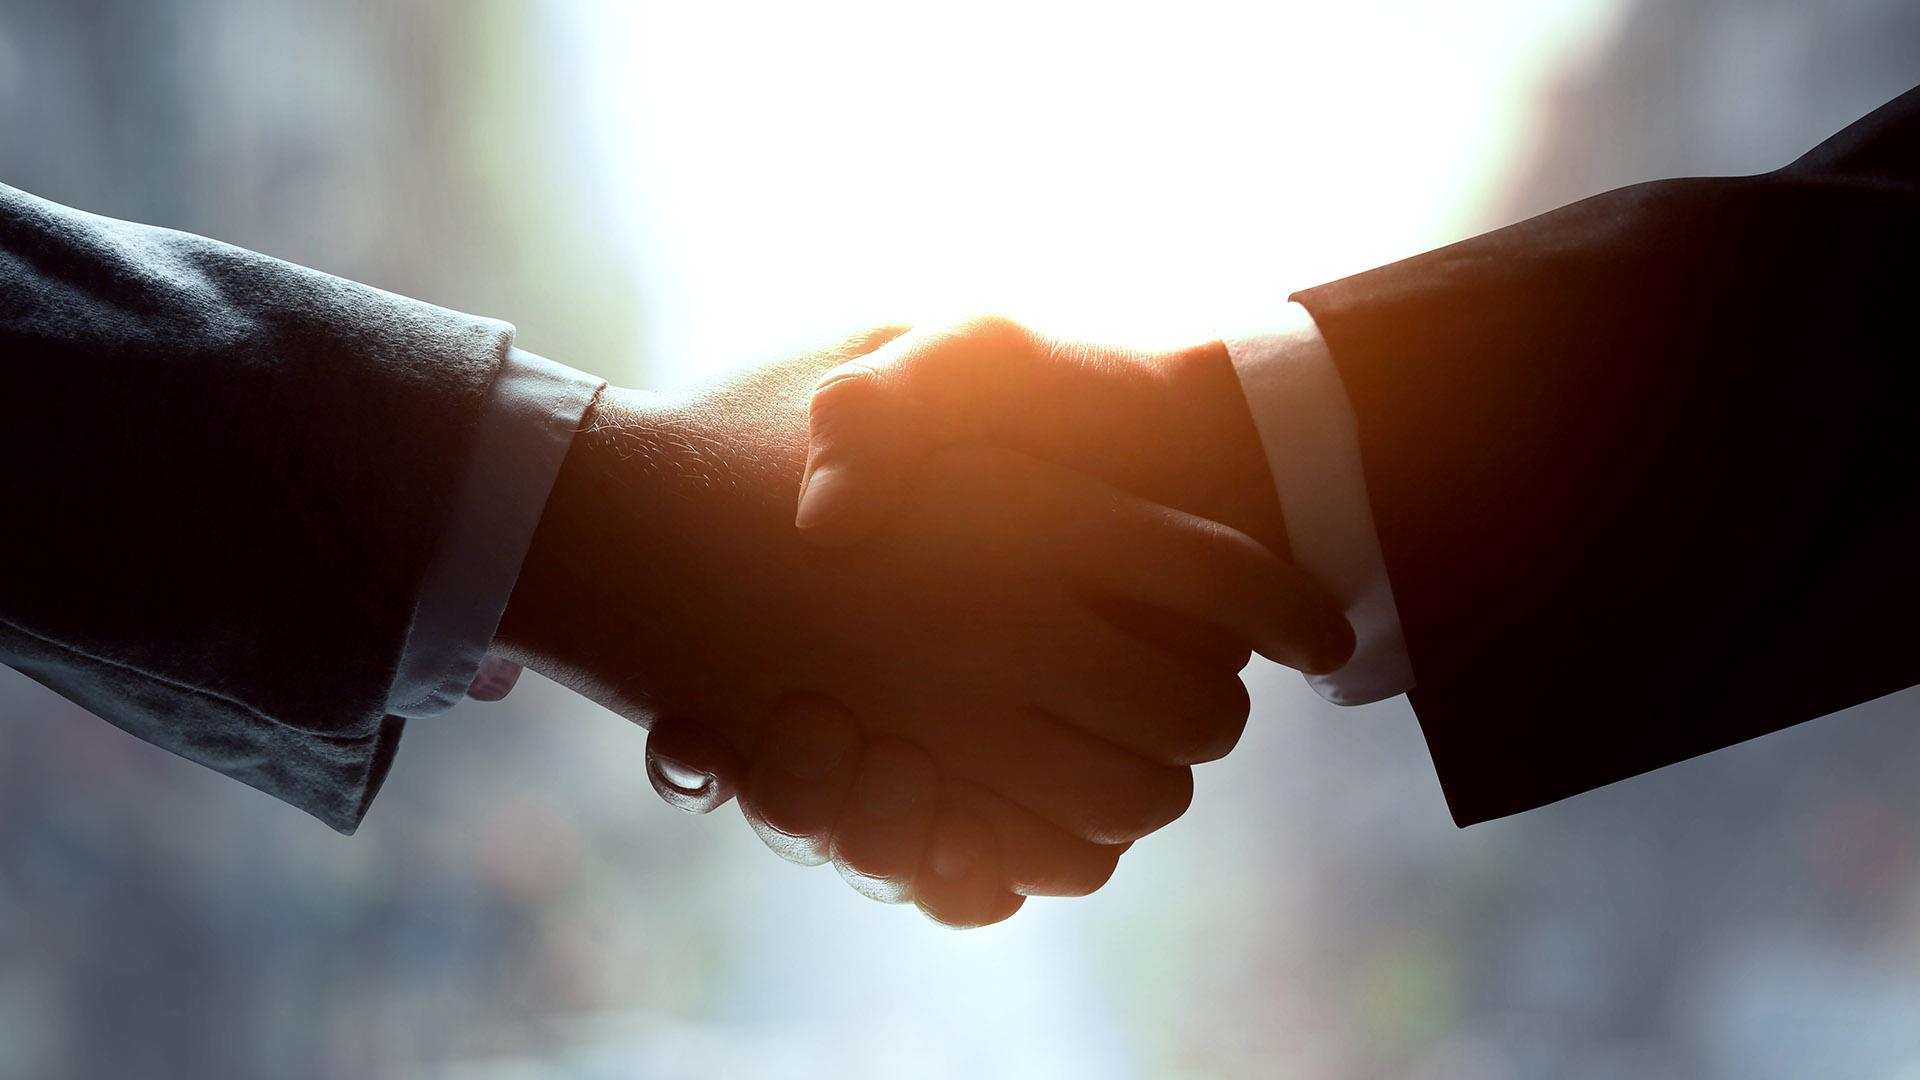 Magicbricks teams up with SBI to sell properties in Andhra Pradesh, Telangana